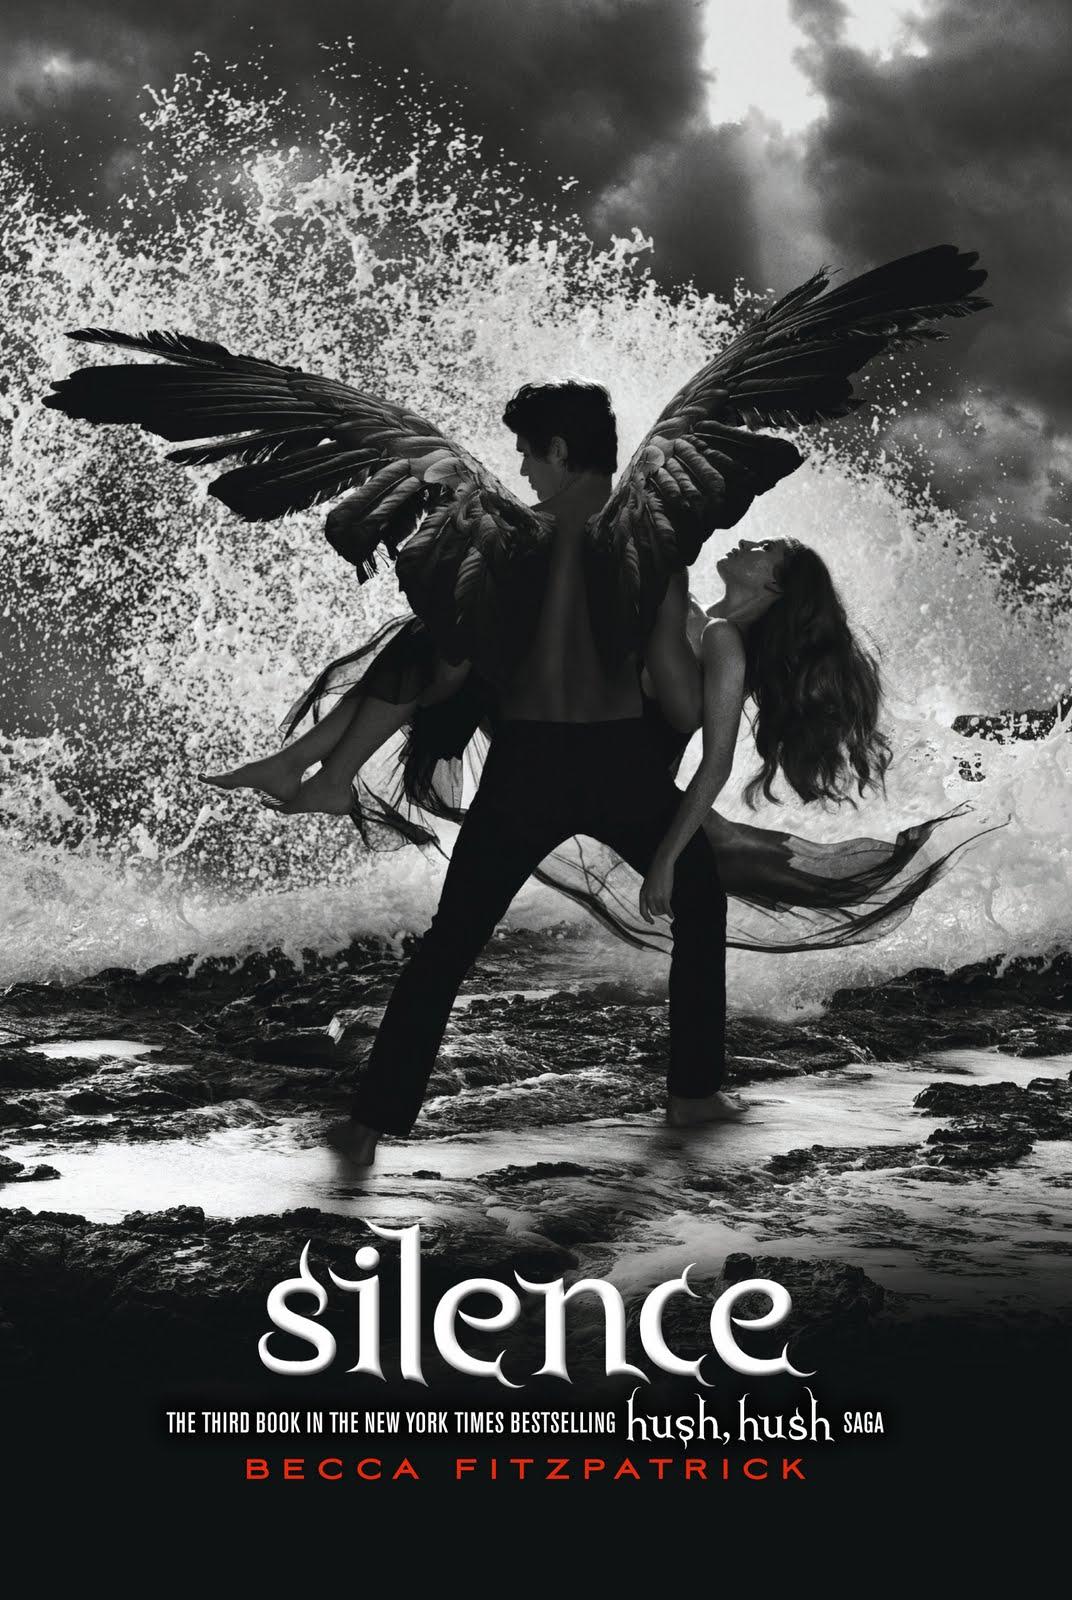 http://3.bp.blogspot.com/-hU0WWpRaw9A/Tb92FApAq8I/AAAAAAAAAIk/aB05BvLxno4/s1600/silence.jpg